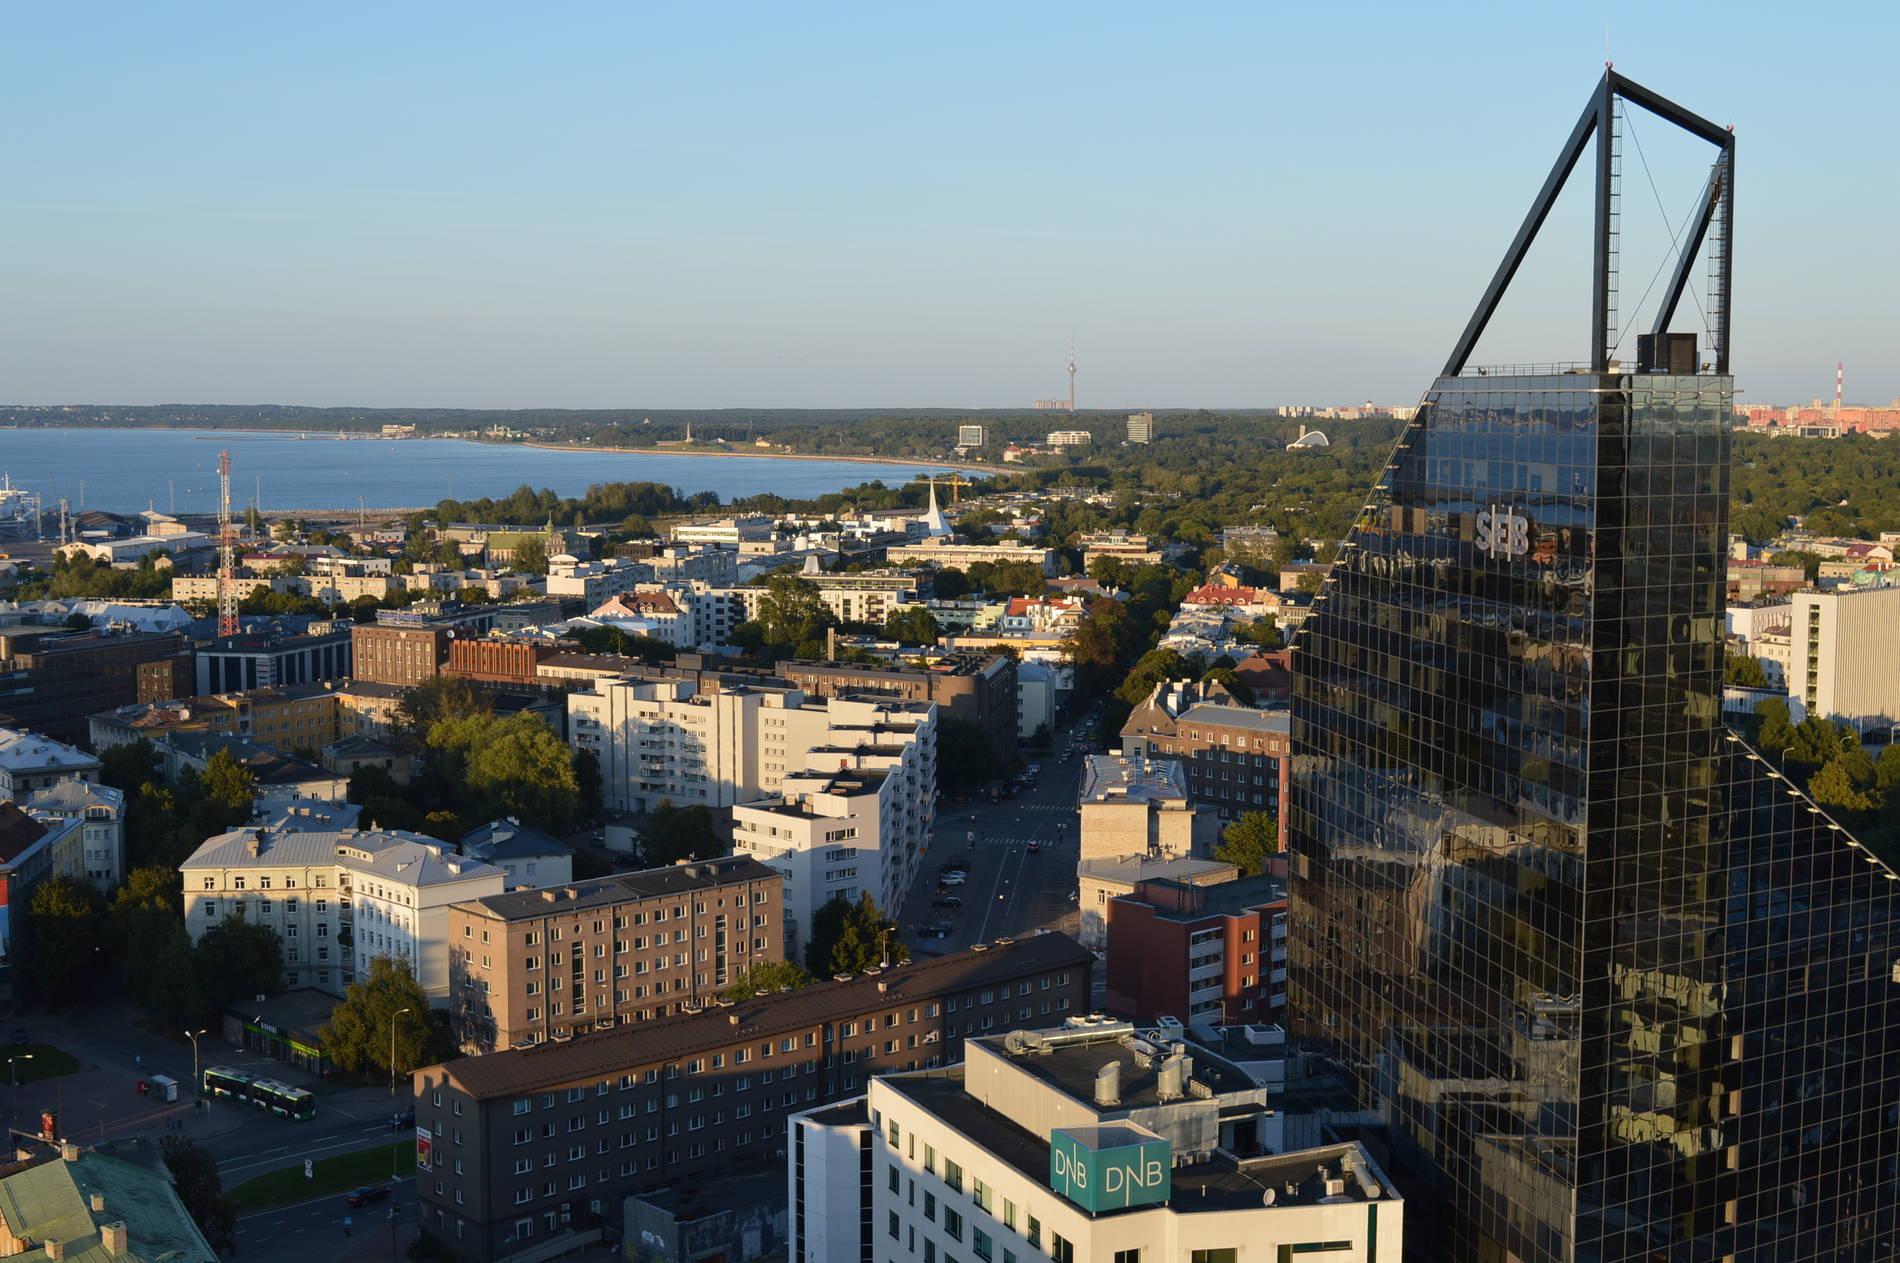 View of the City Center of Tallinn, Estonia